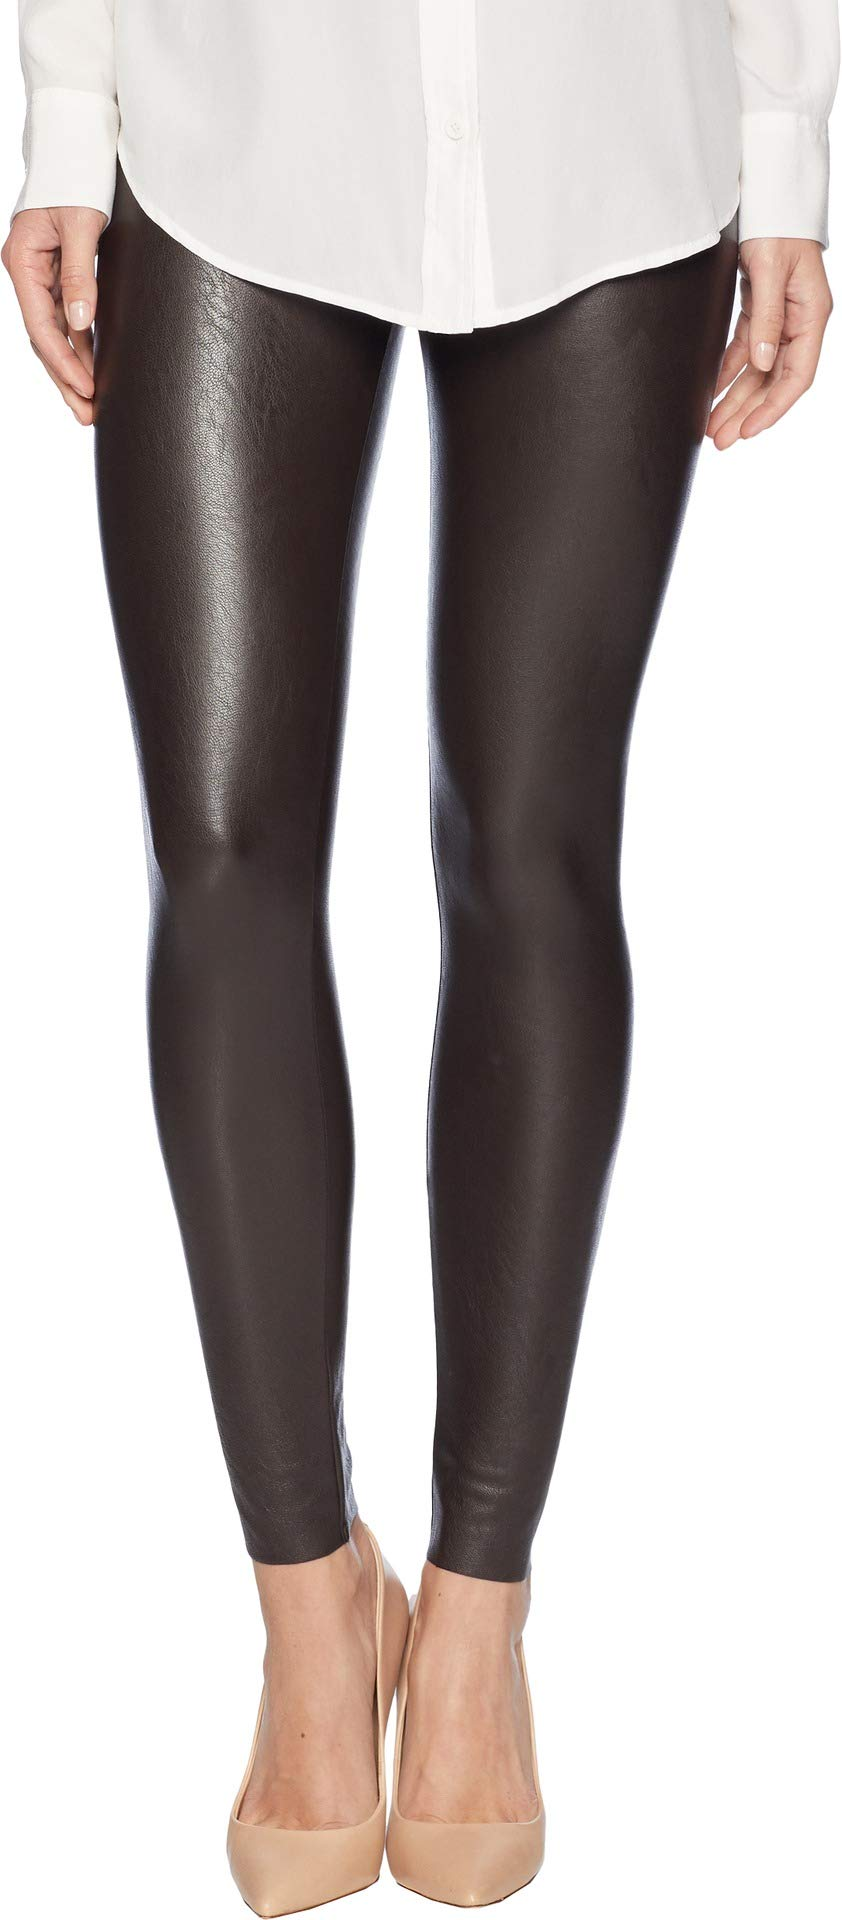 commando Women's Perfect Control Faux Leather Leggings SLG06 Espresso Large